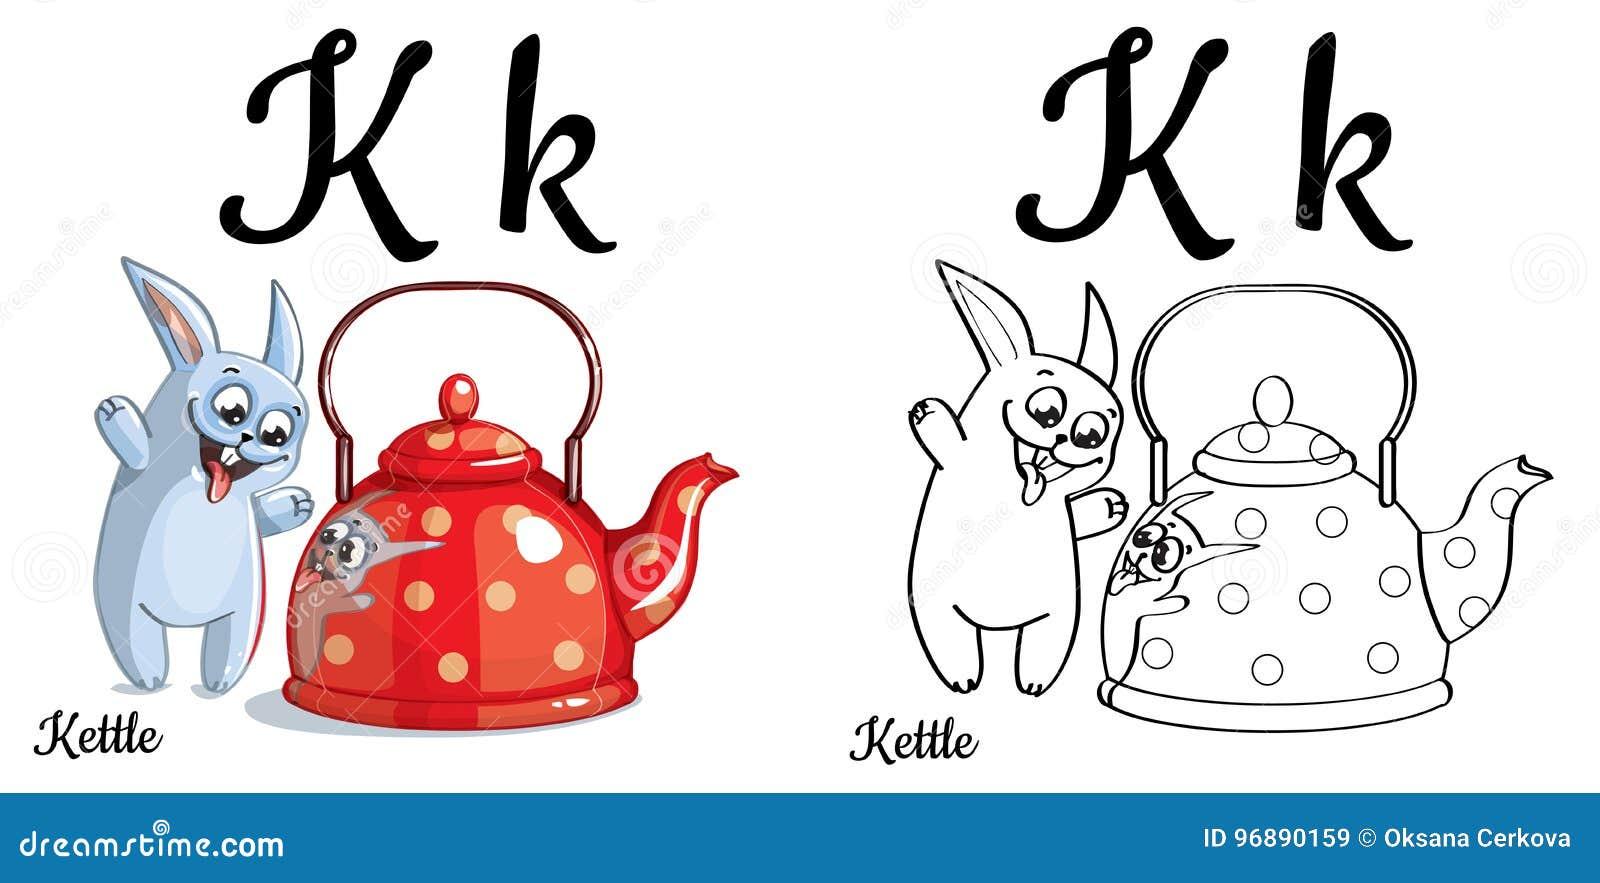 Kettle Vector Alphabet Letter K Coloring Page Stock Illustration - Letter-k-coloring-page